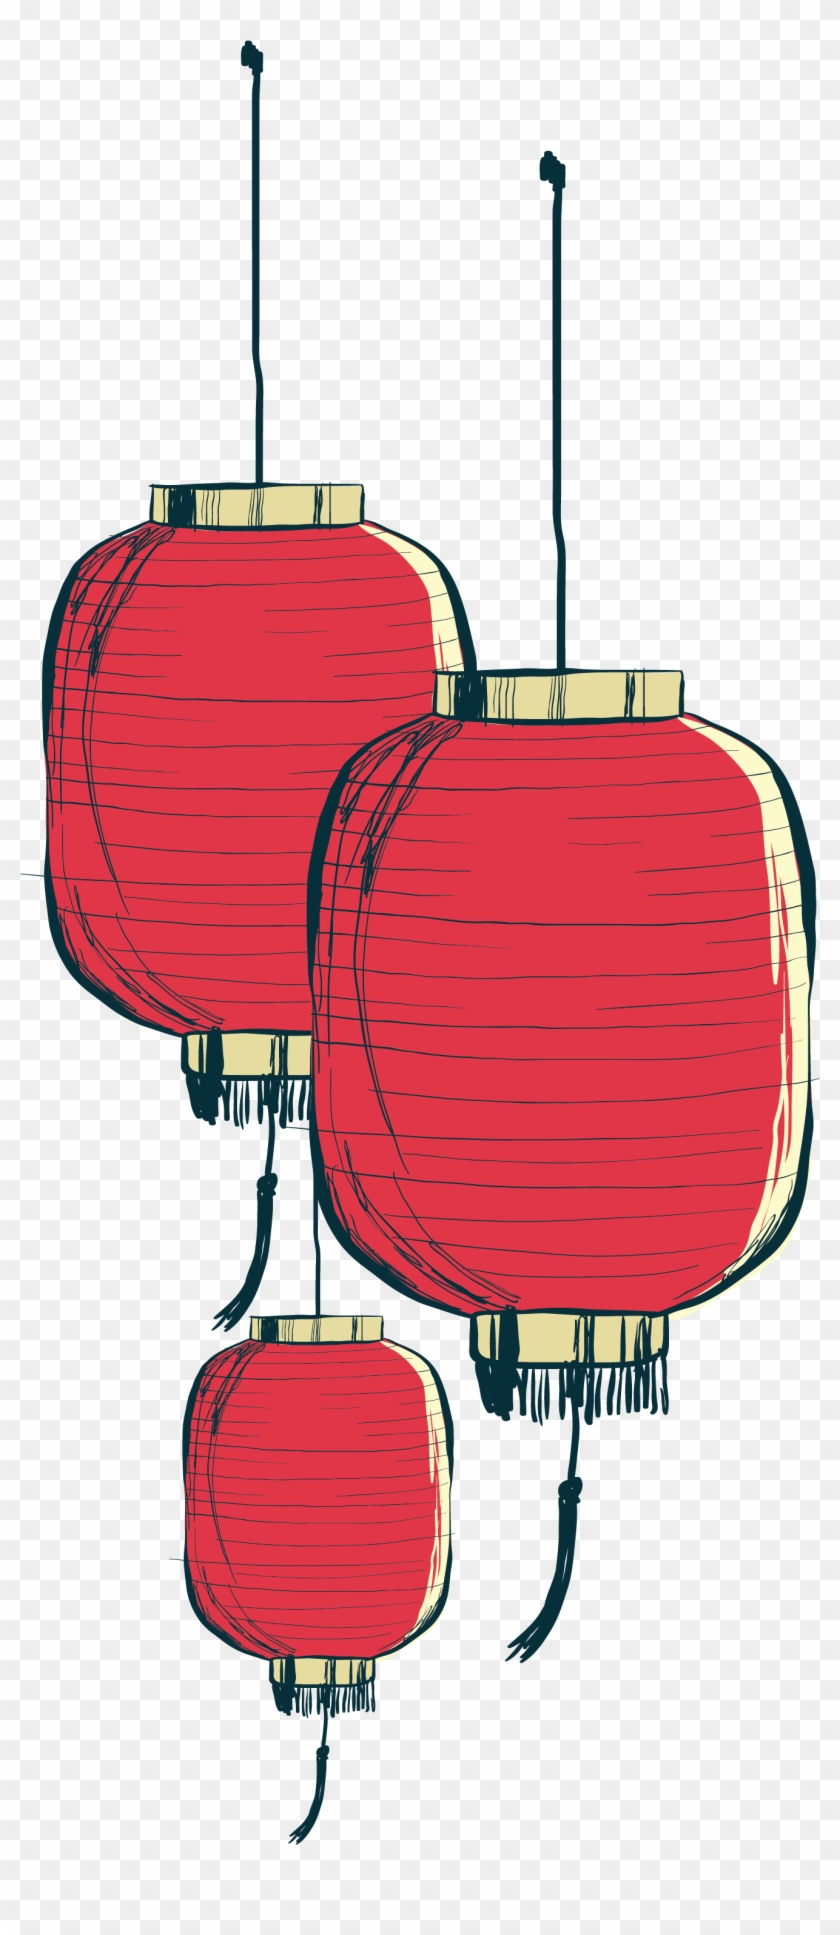 Hand Painted Chinese Lantern - Gold Chinese Lantern Png #703323